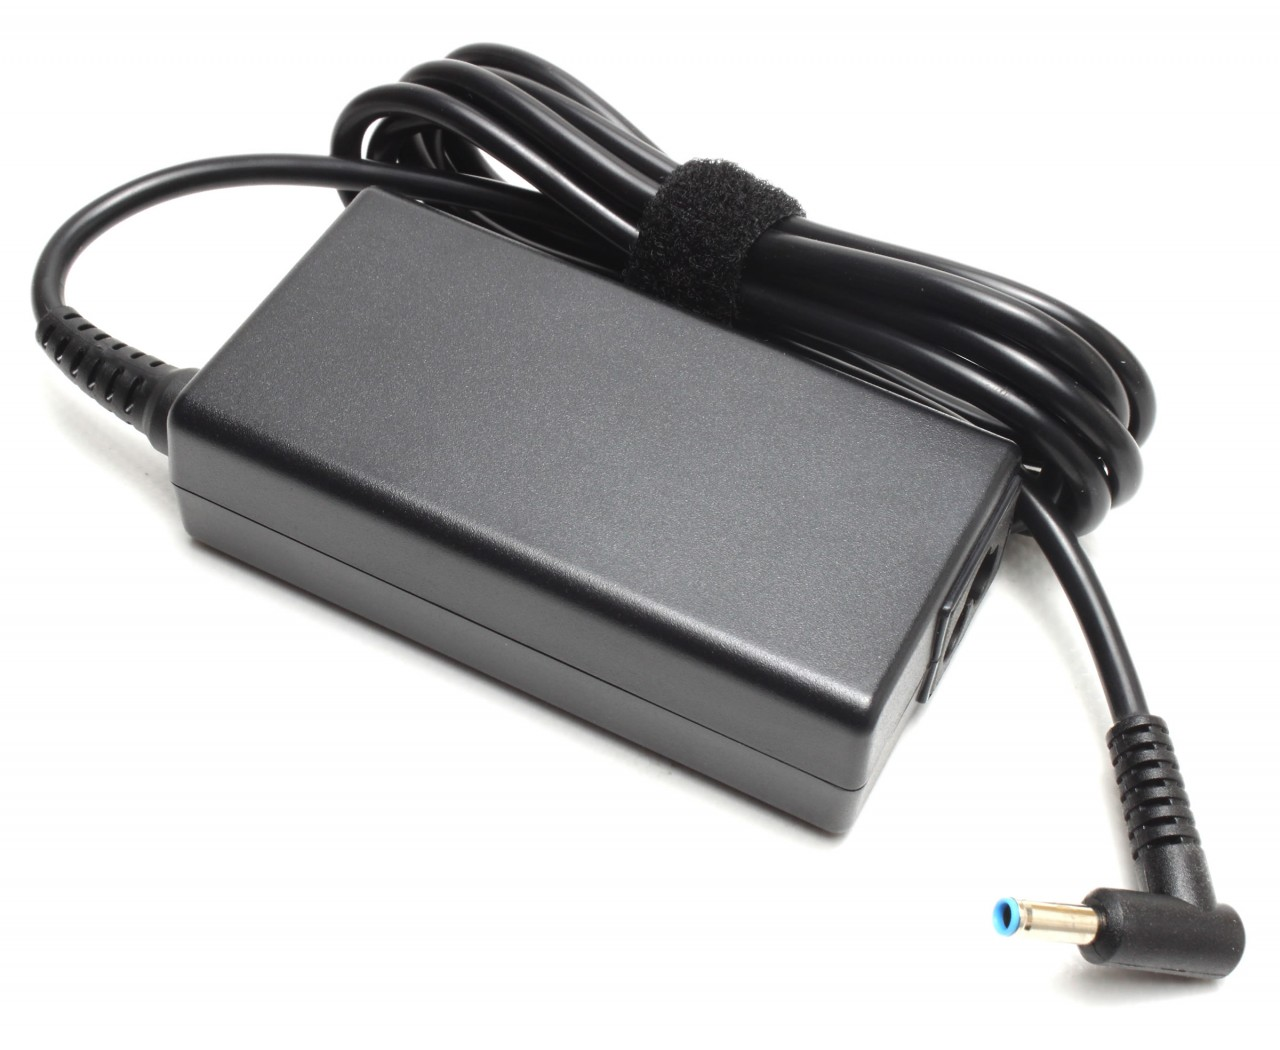 Incarcator HP Pavilion 17z e 45W mufa 4.5x3.0mm cu pin imagine powerlaptop.ro 2021